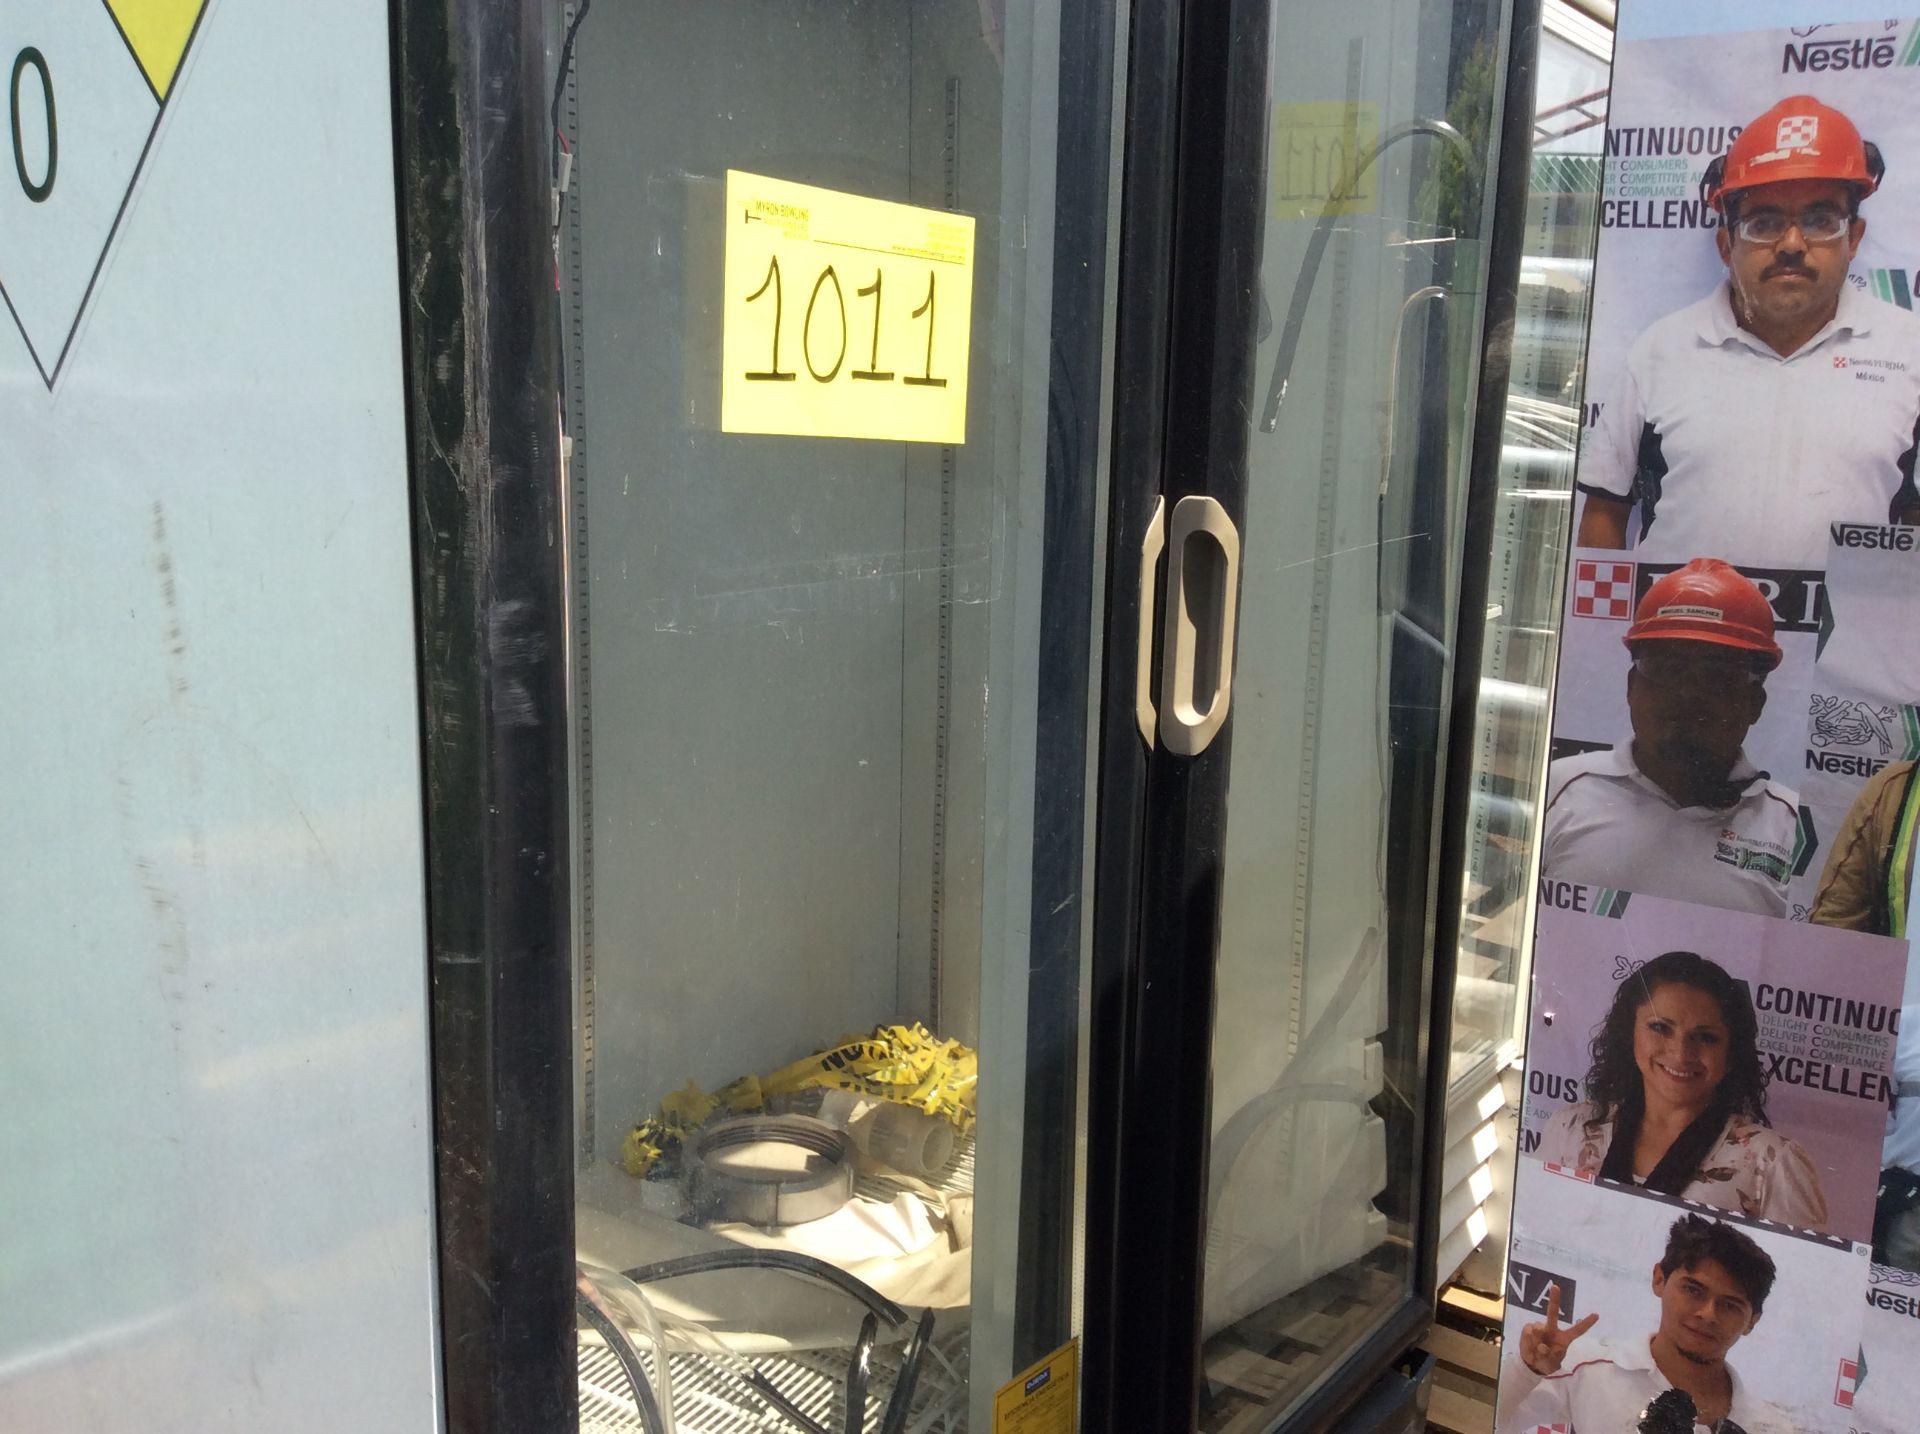 1 Ojeda refrigerator of double glass door model RV2P36 serial number 0636323-34305 120V - Image 3 of 14